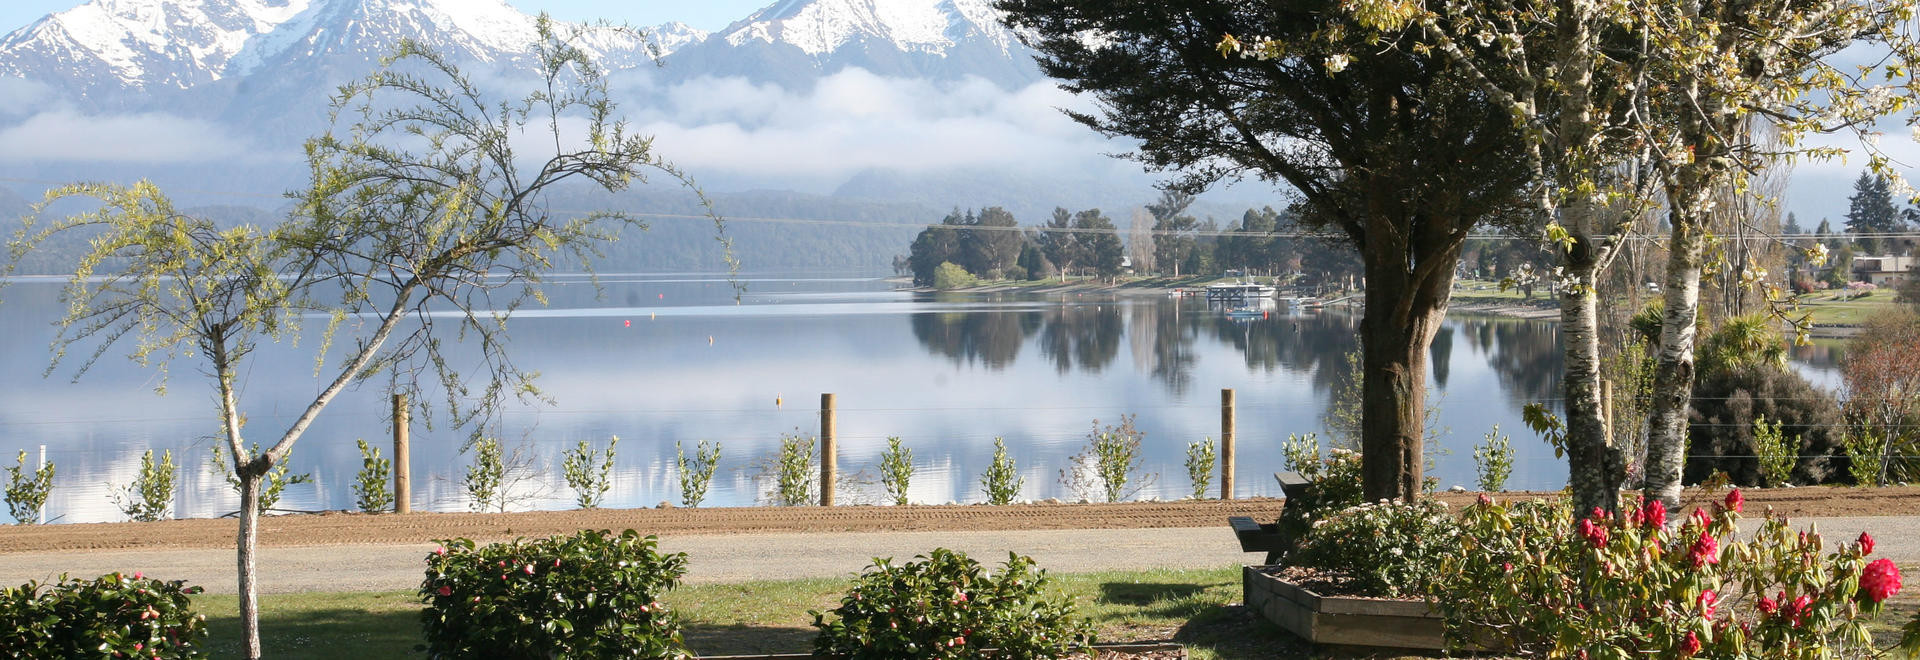 te-anau-lakeview-kiwi-holiday-park.jpg